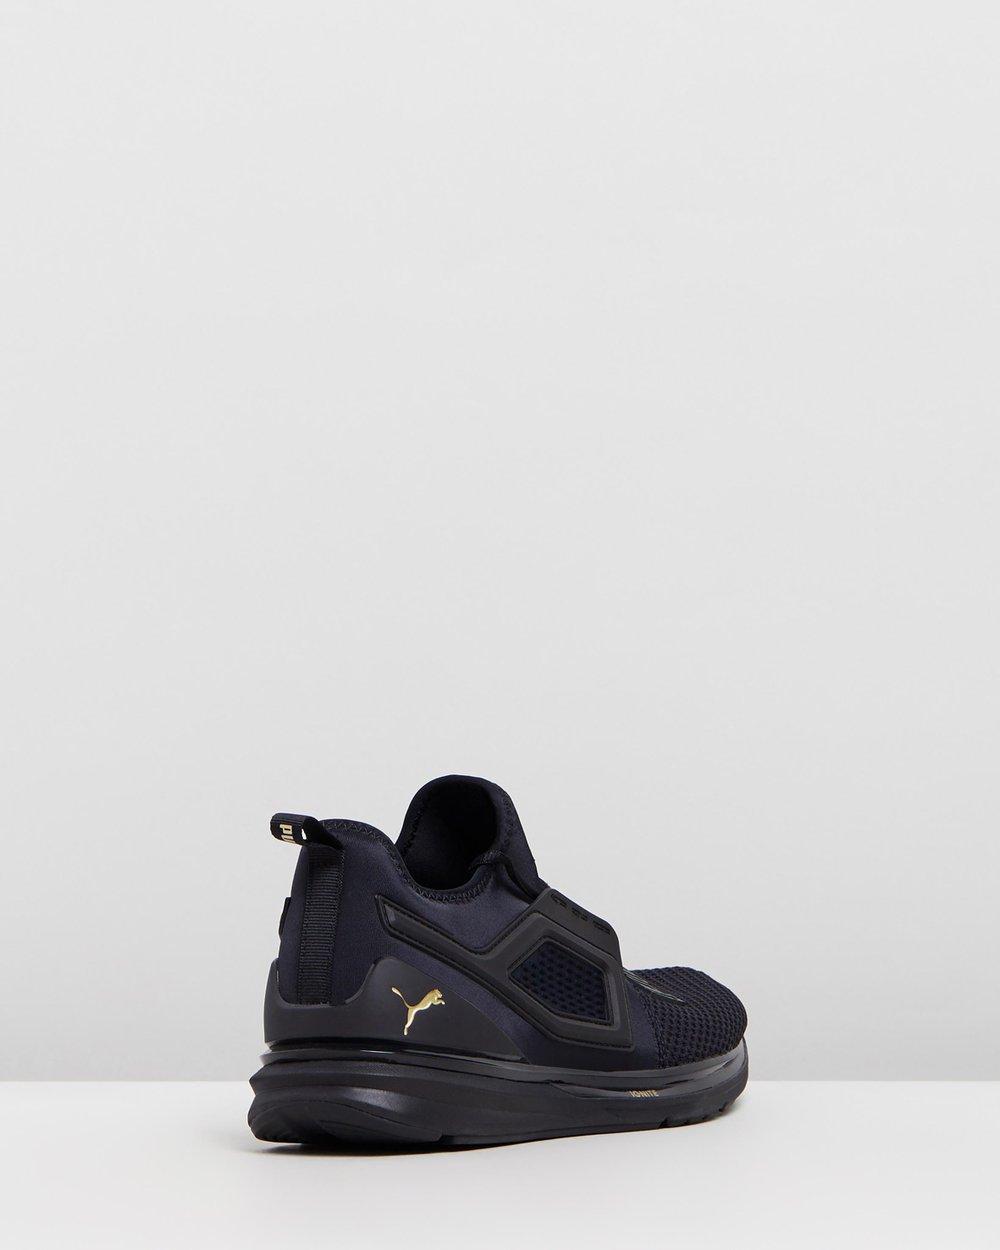 1d290d9a7e7b IGNITE Limitless 2 Running Shoes - Men s by Puma Online